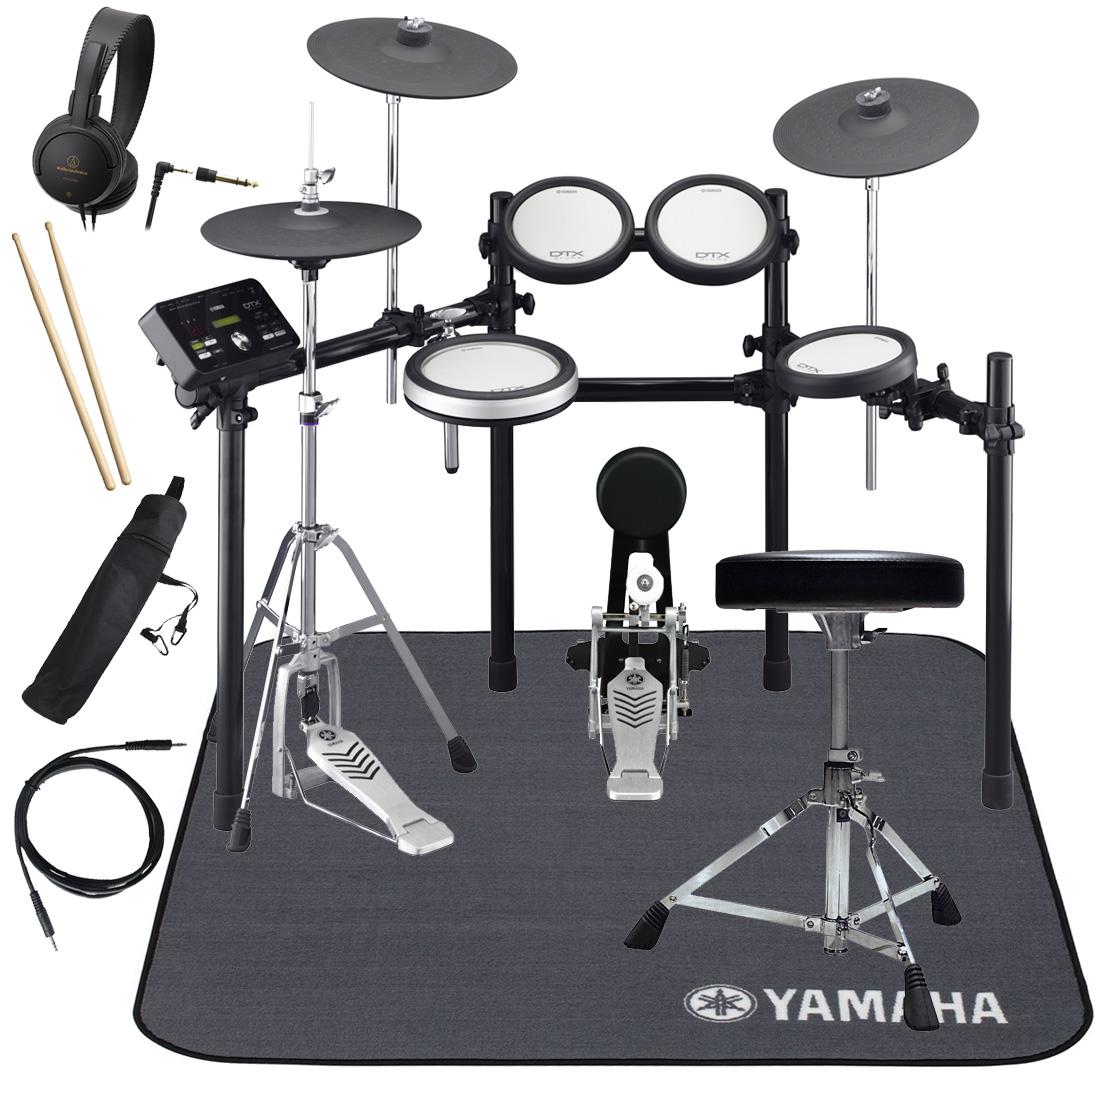 YAMAHA 電子ドラム DTX562KFS ドラムマットDM1314付き スターターパック【YRK】